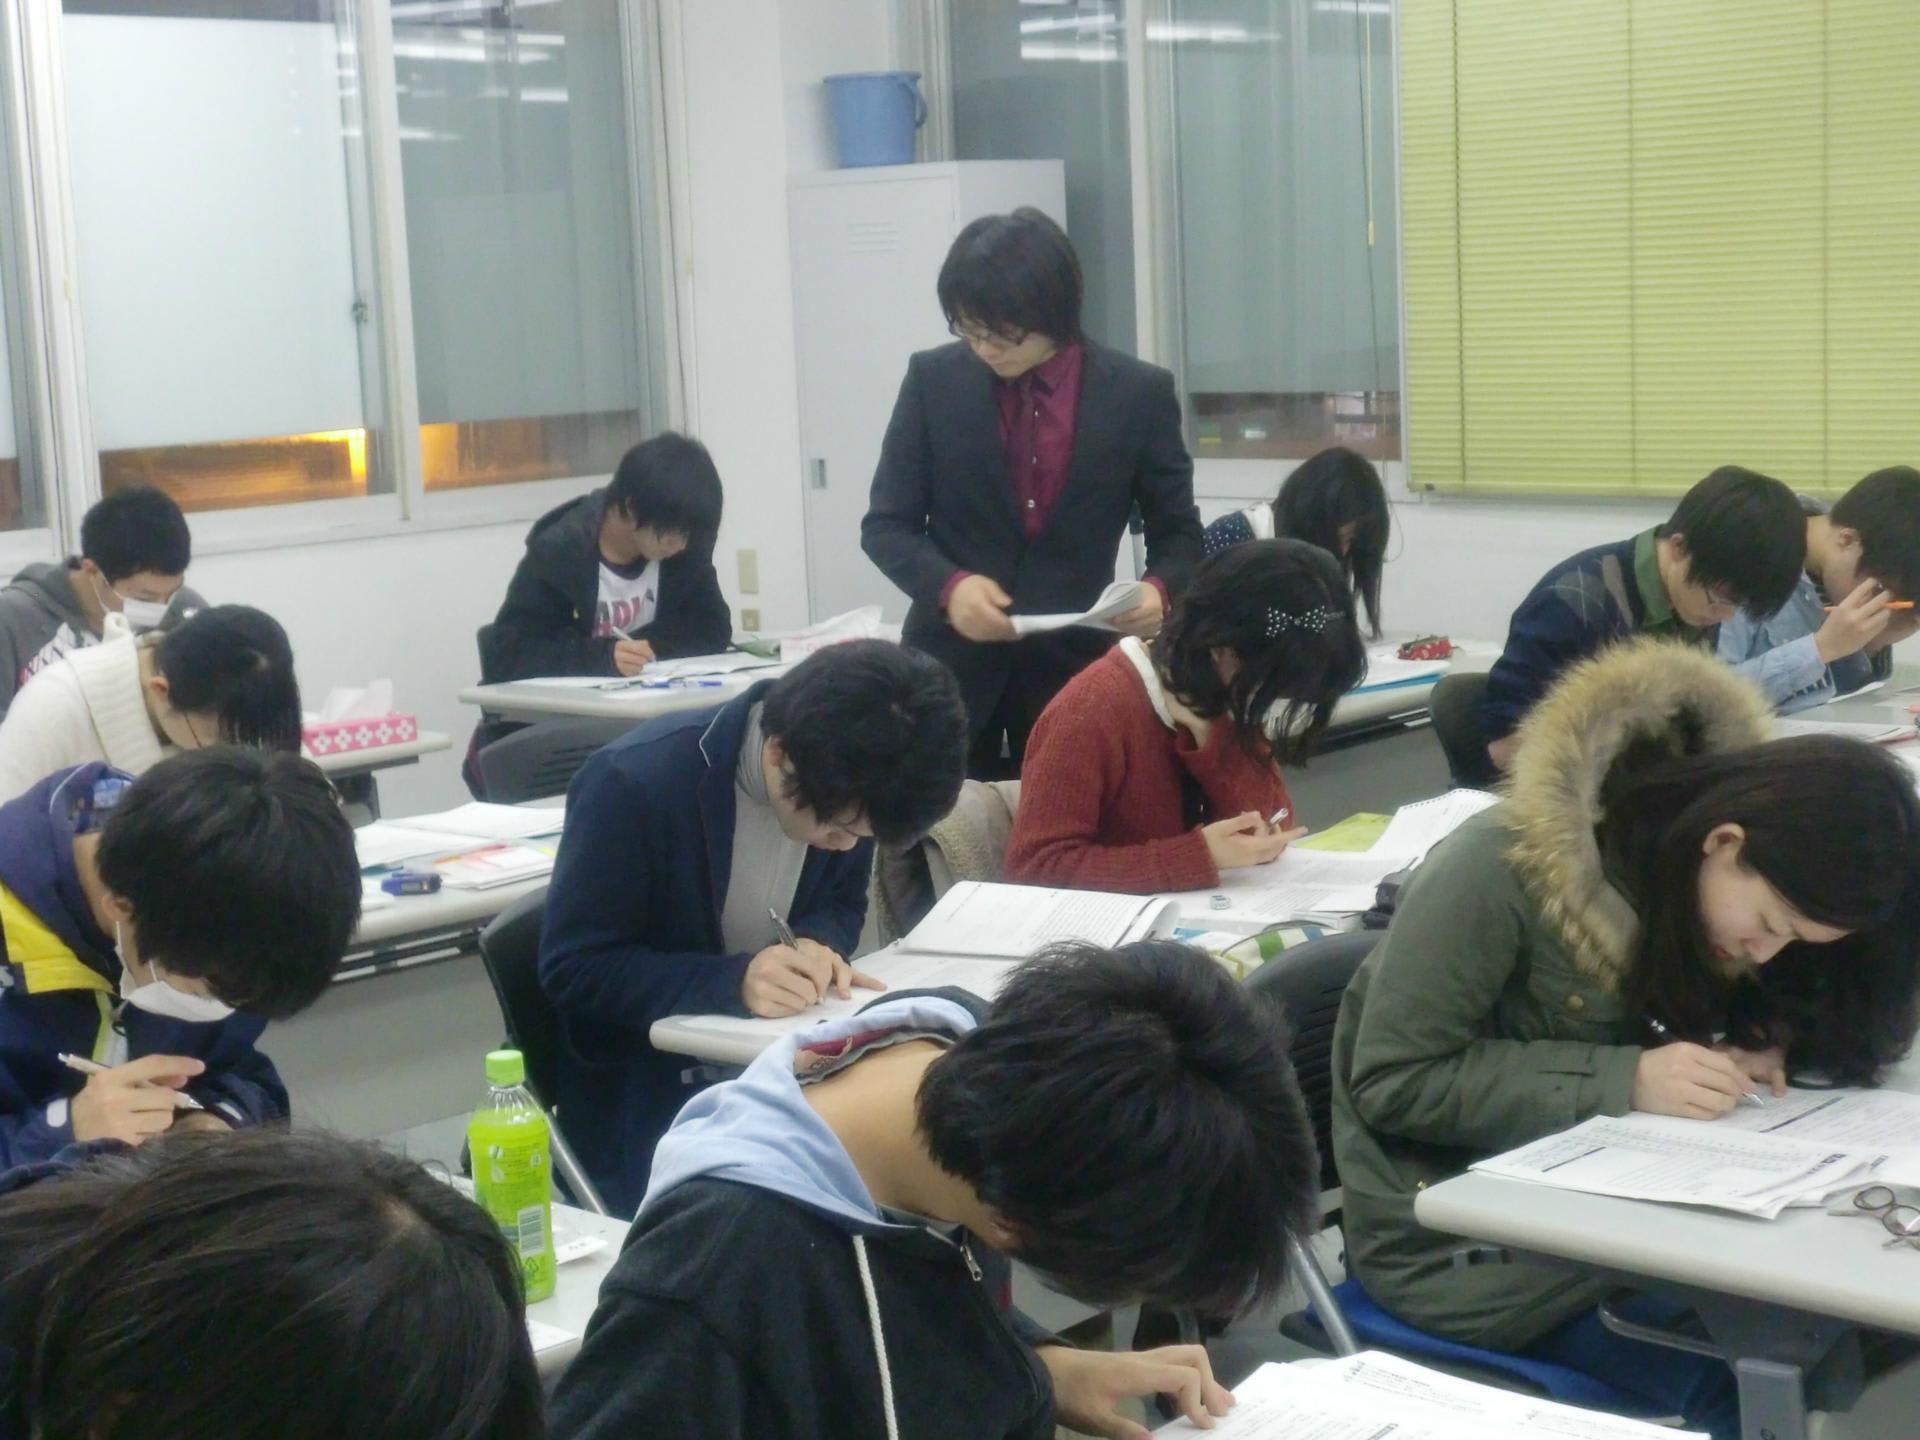 1月10日 朝の15分勉強 - 札幌市...